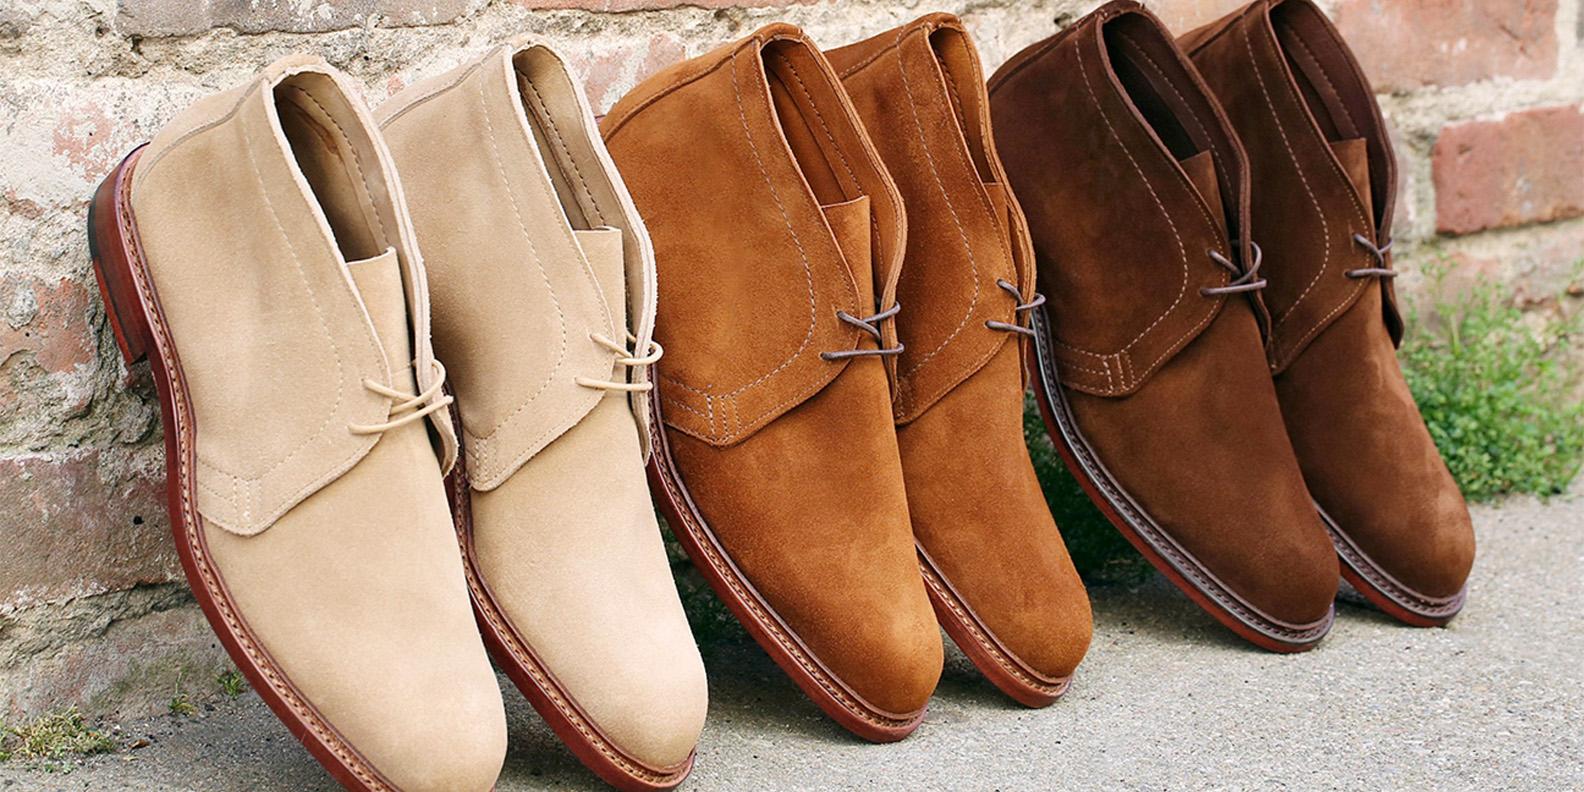 Allen Edmonds Boot Season Sale offers up to 30% off popular